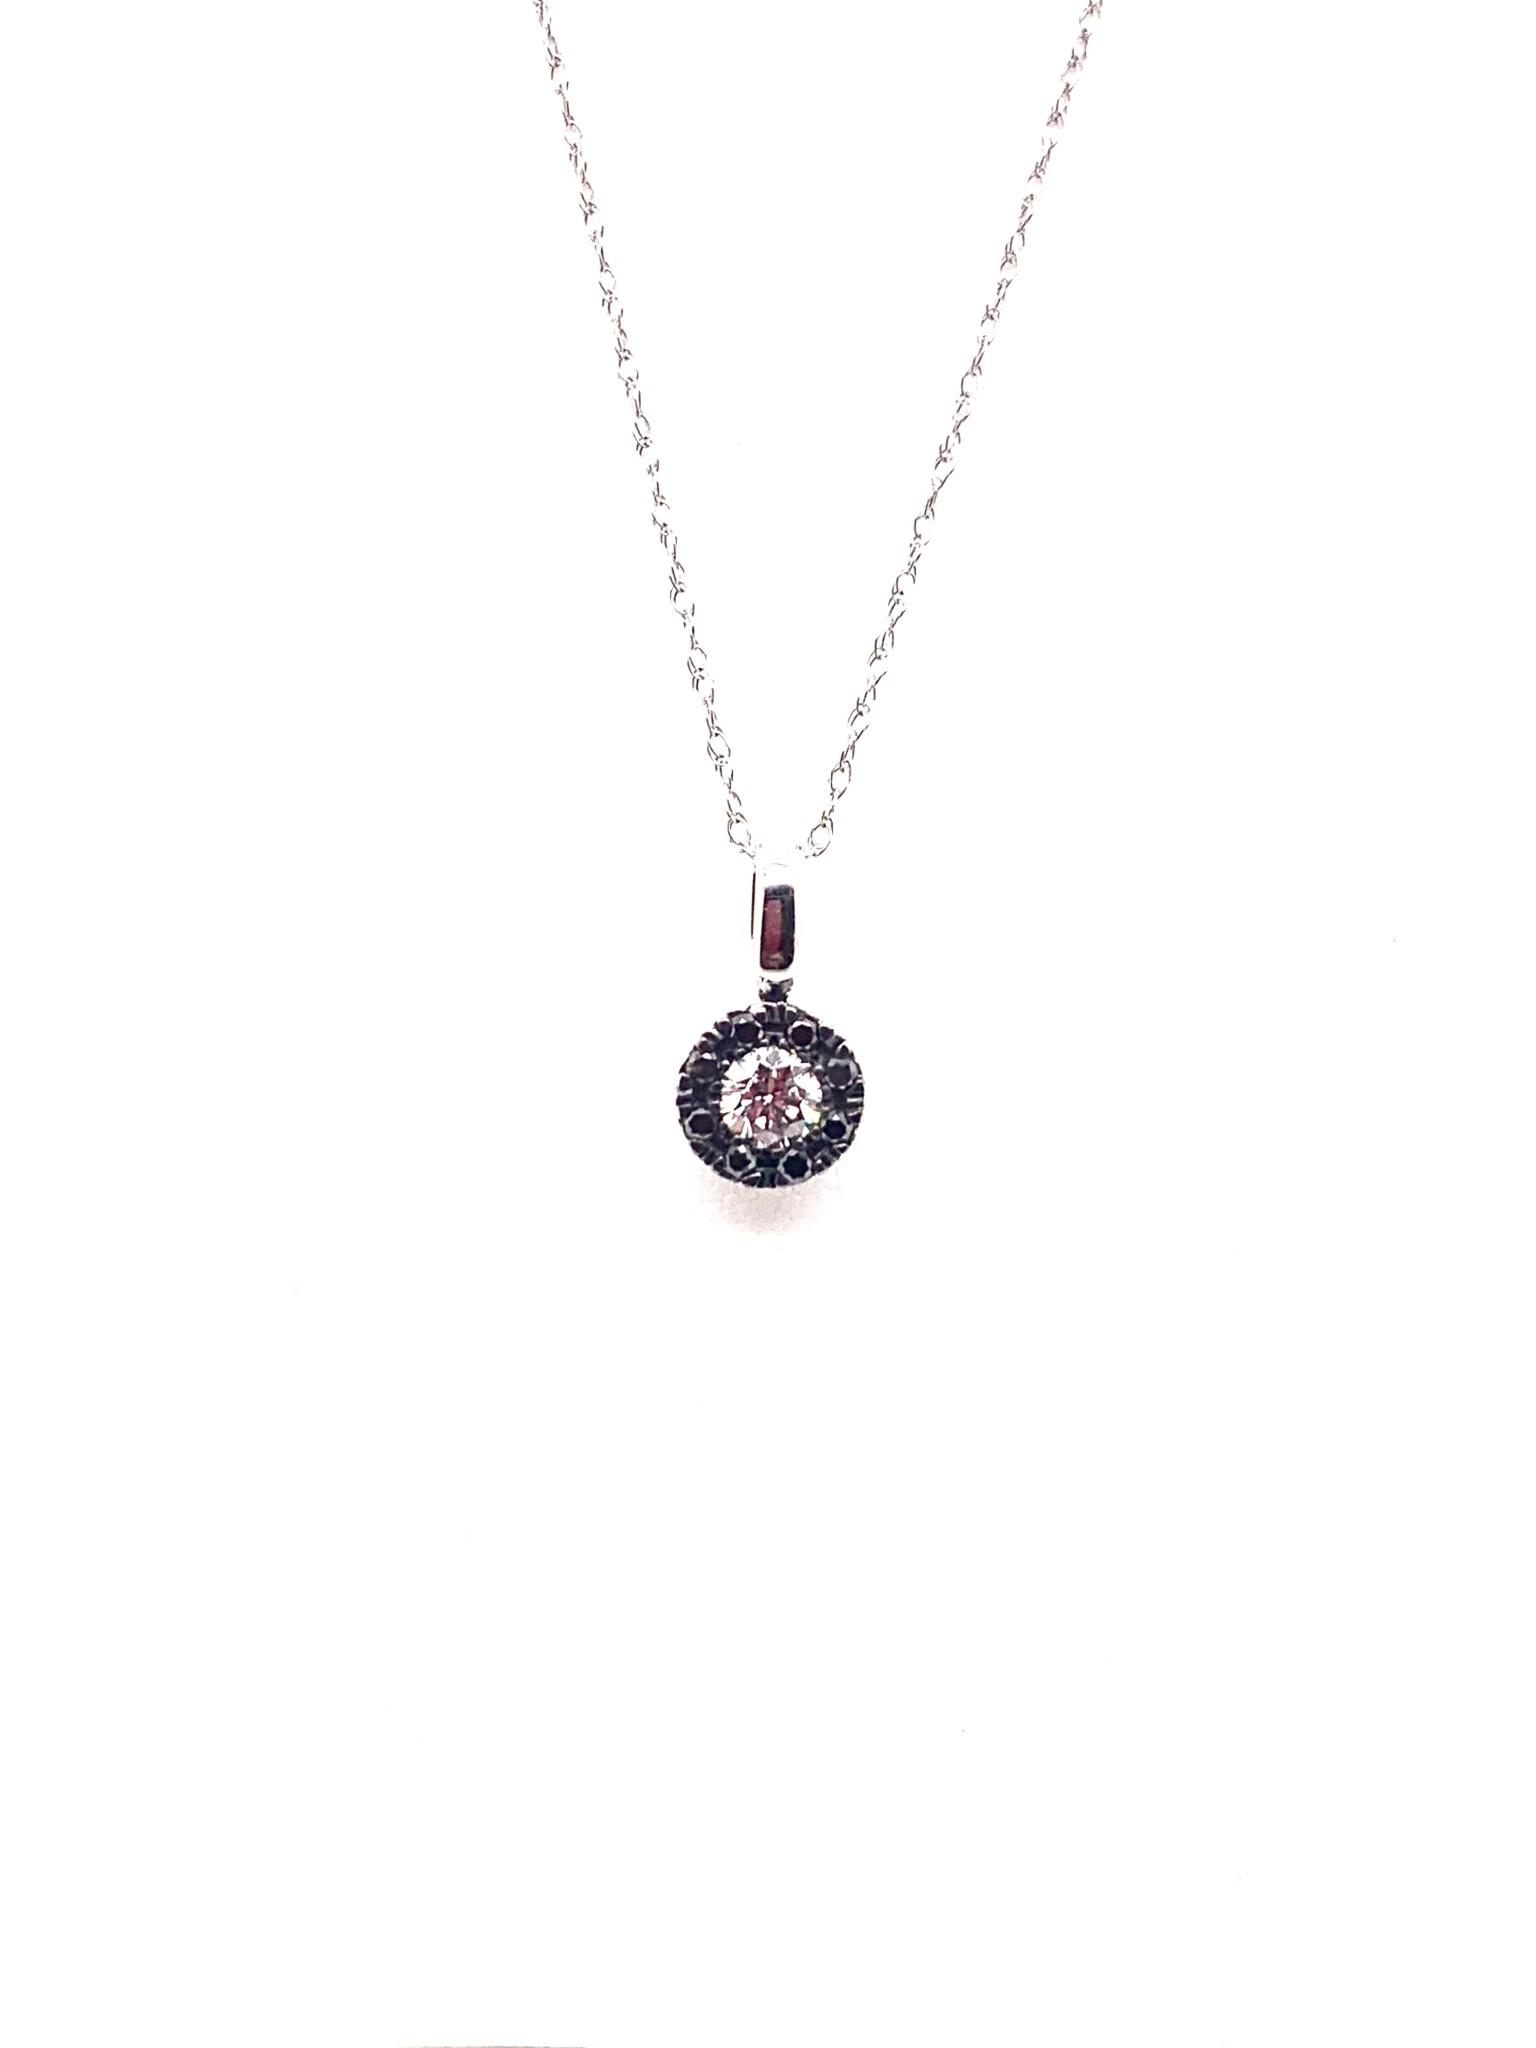 10K white gold 0.20ct diamond with 0.10ct black diamond halo pendant